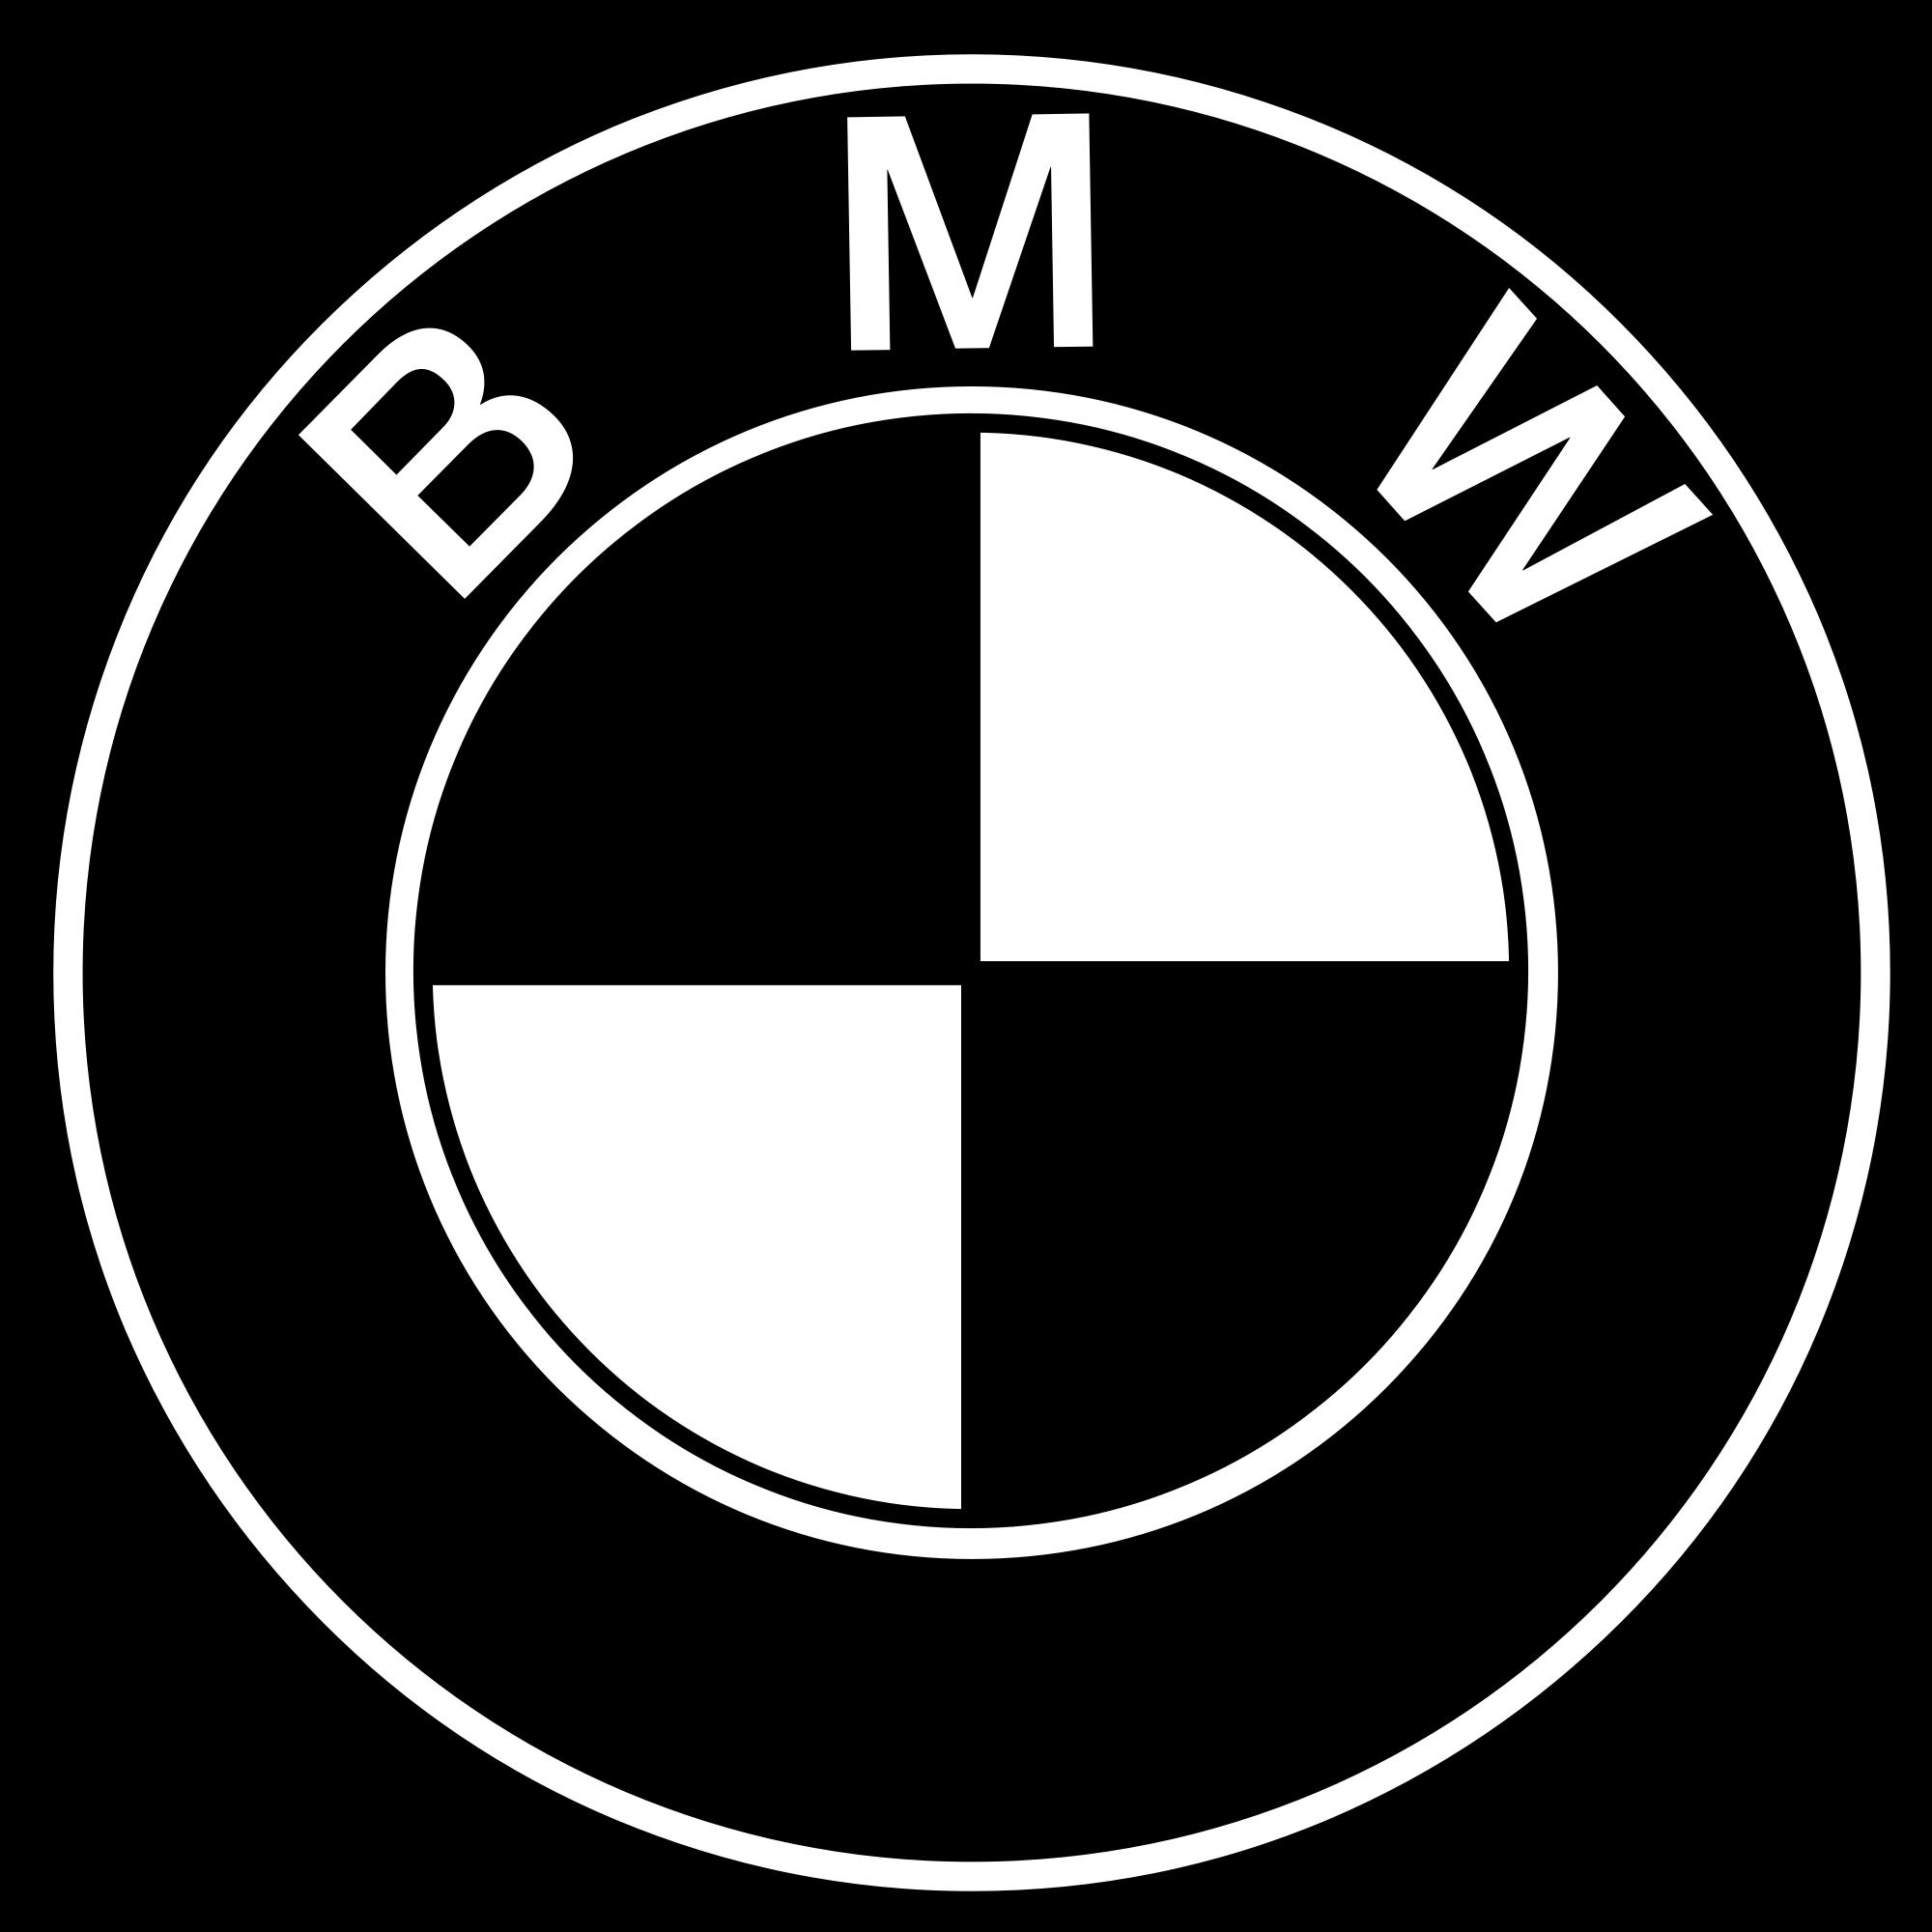 Bmw Flat Vector Png Transparent Bmw Flat Vector Png Images